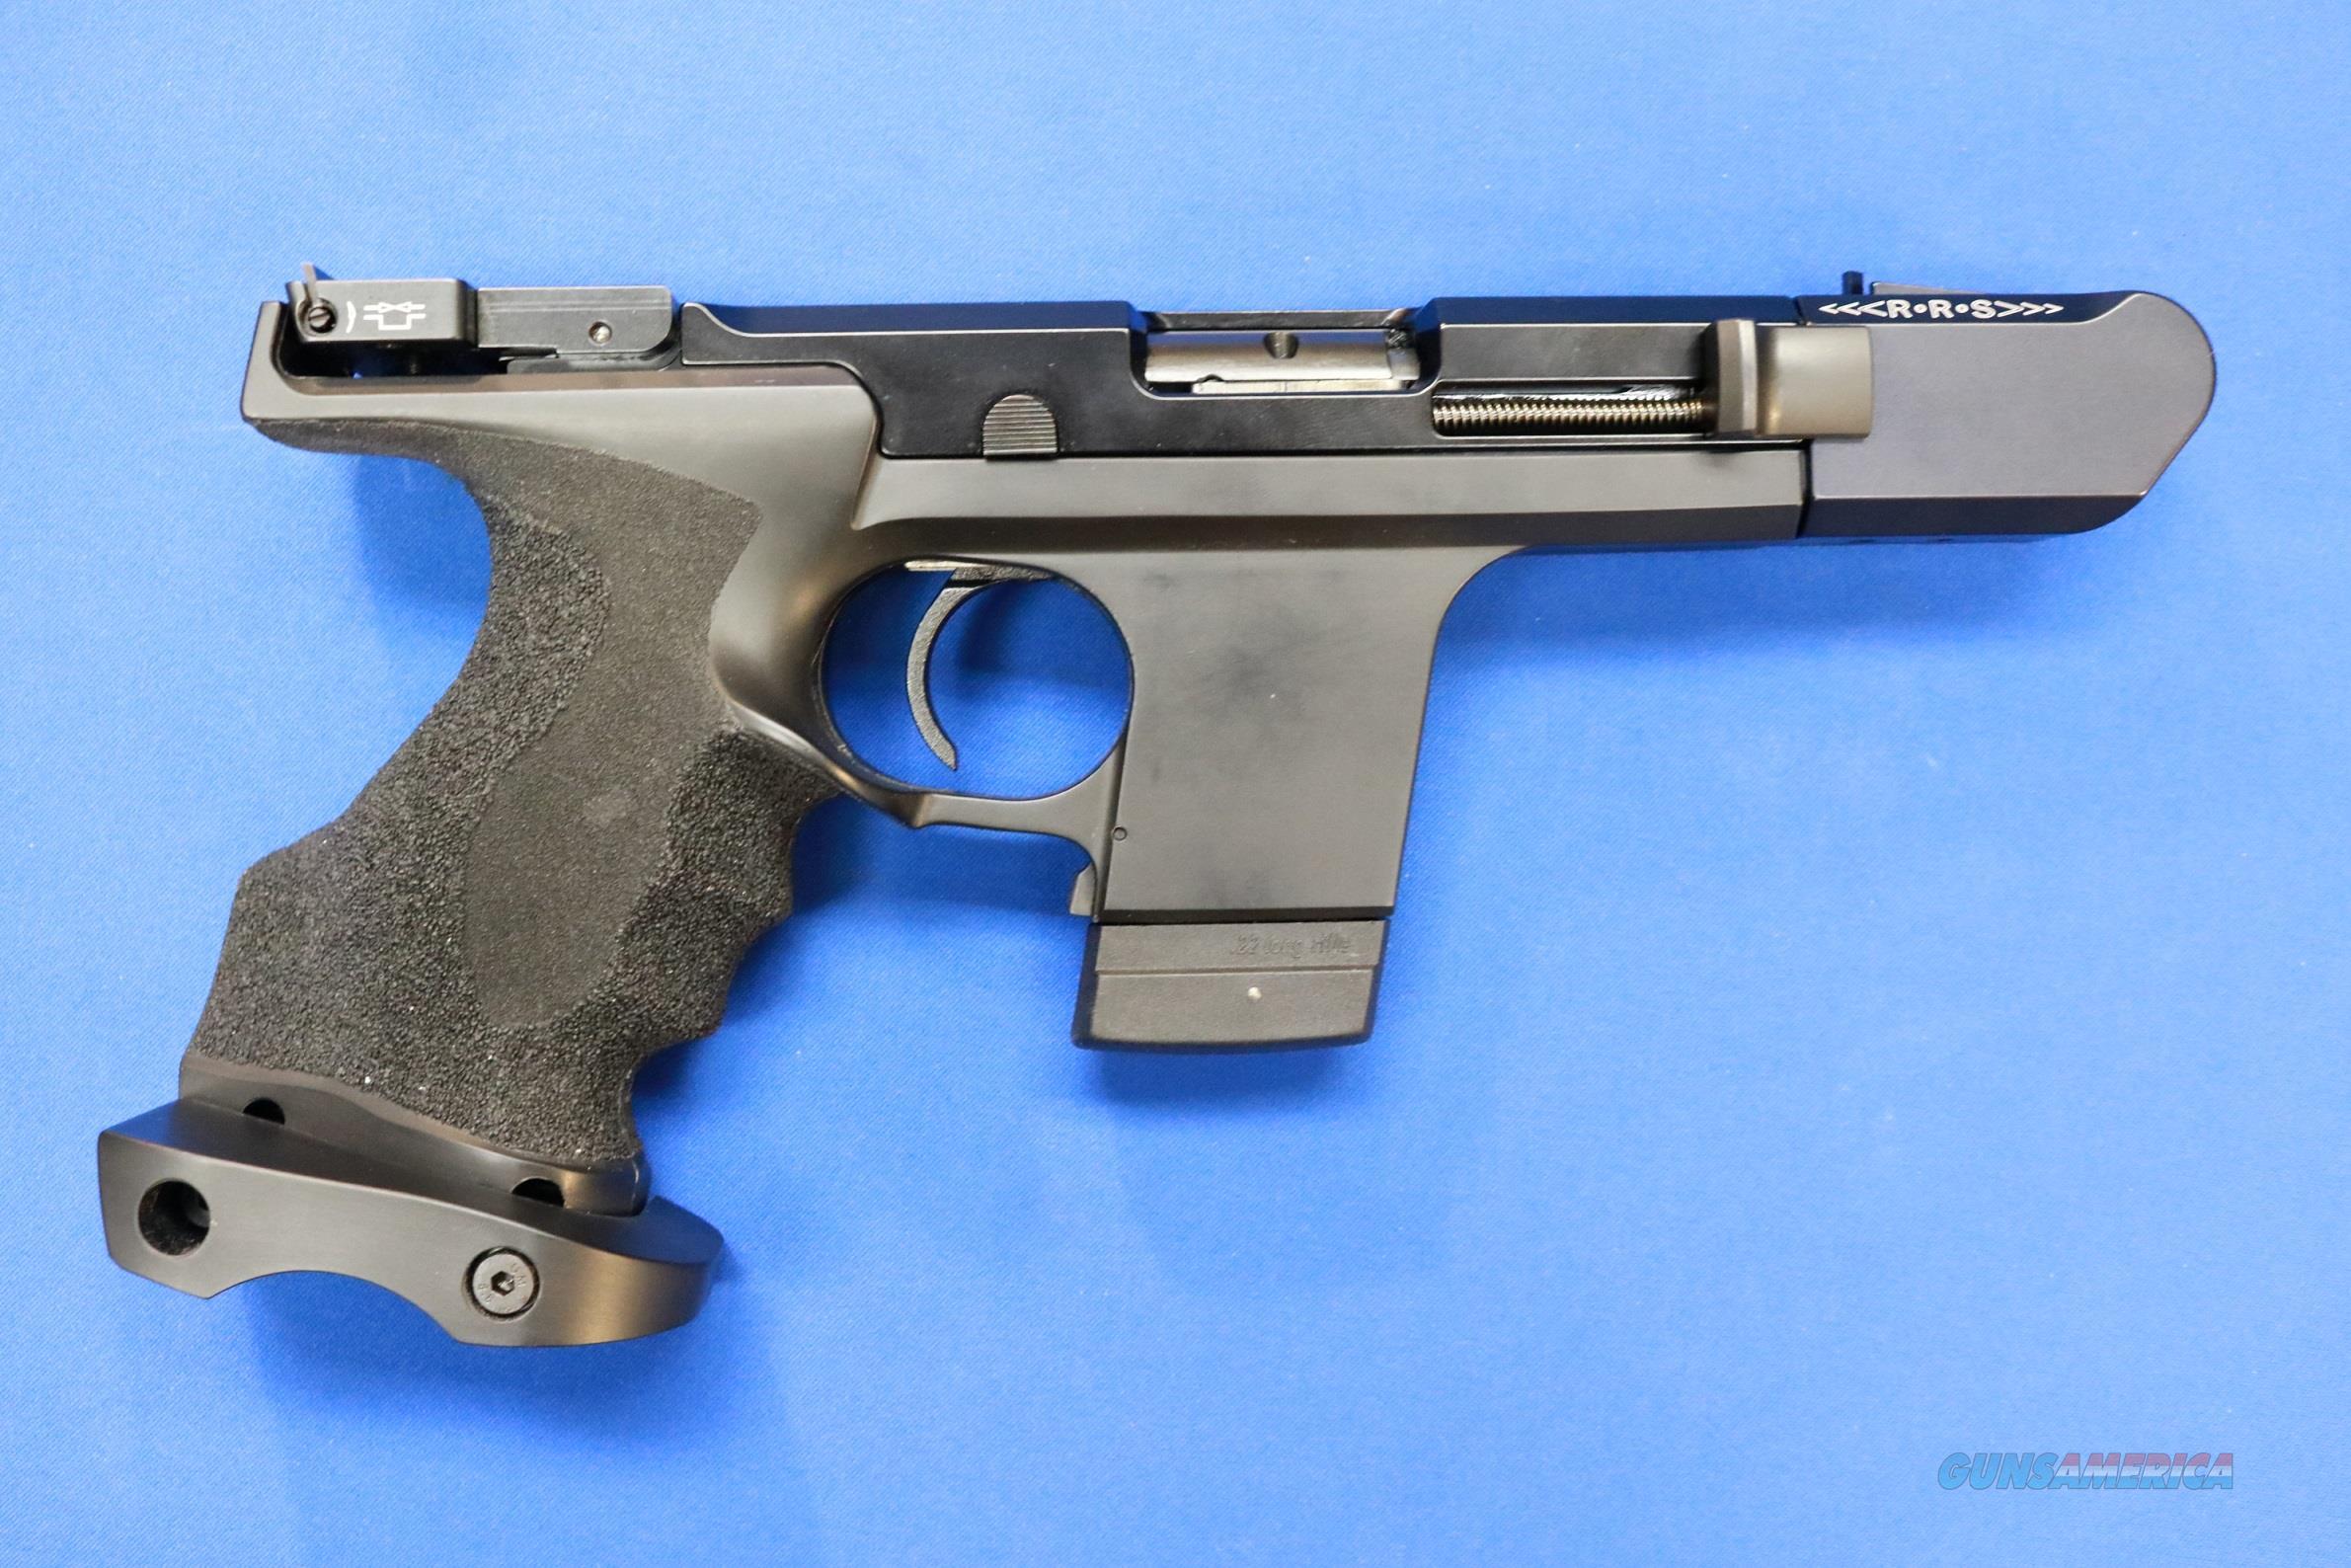 HAMMERLI SP20 RRS TARGET PISTOL .22 LR w/BOX & 2 MAGS  Guns > Pistols > Hammerli Pistols